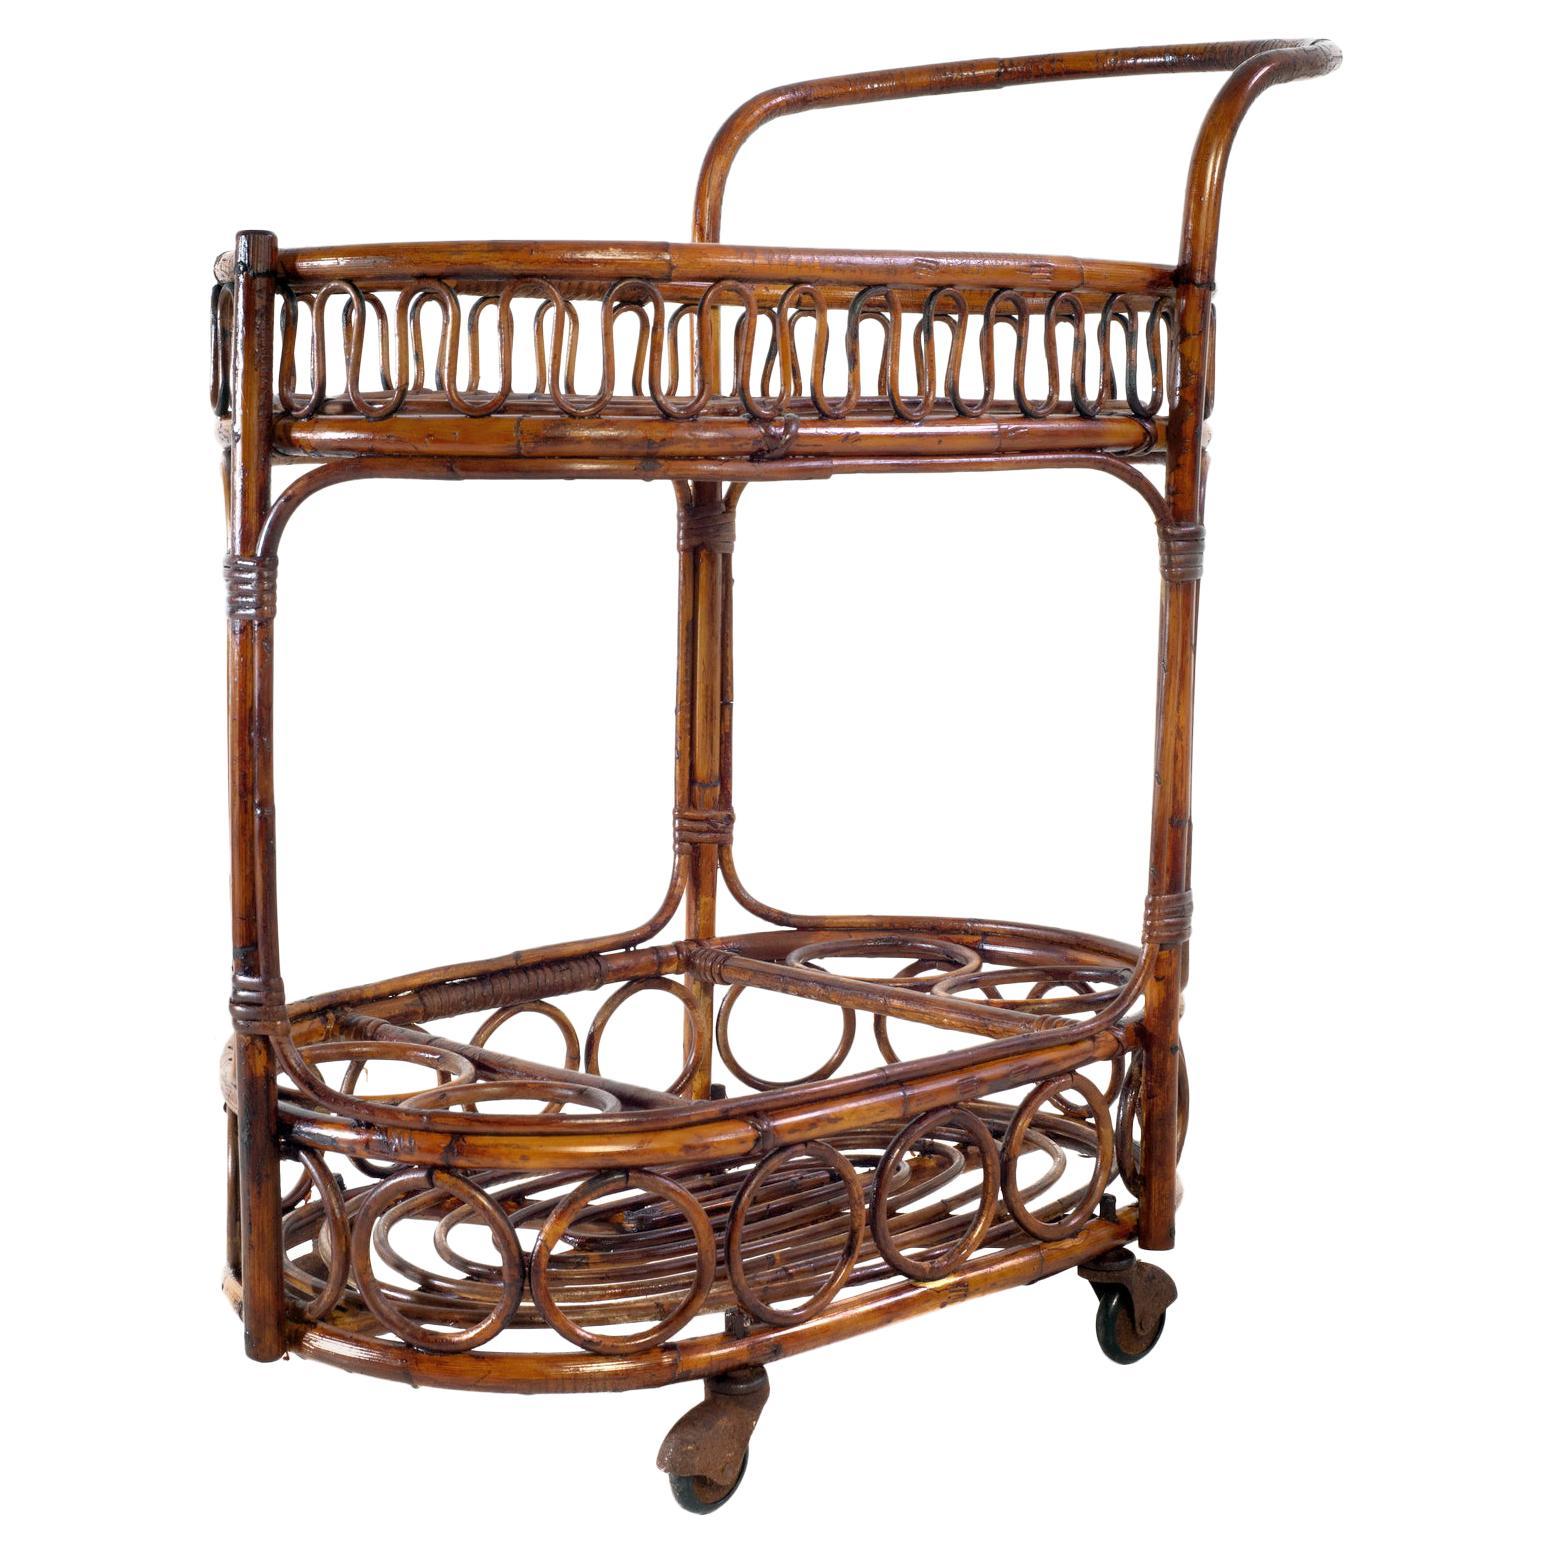 Midcentury Bamboo and Rattan Italian Bar Cart, 1960s